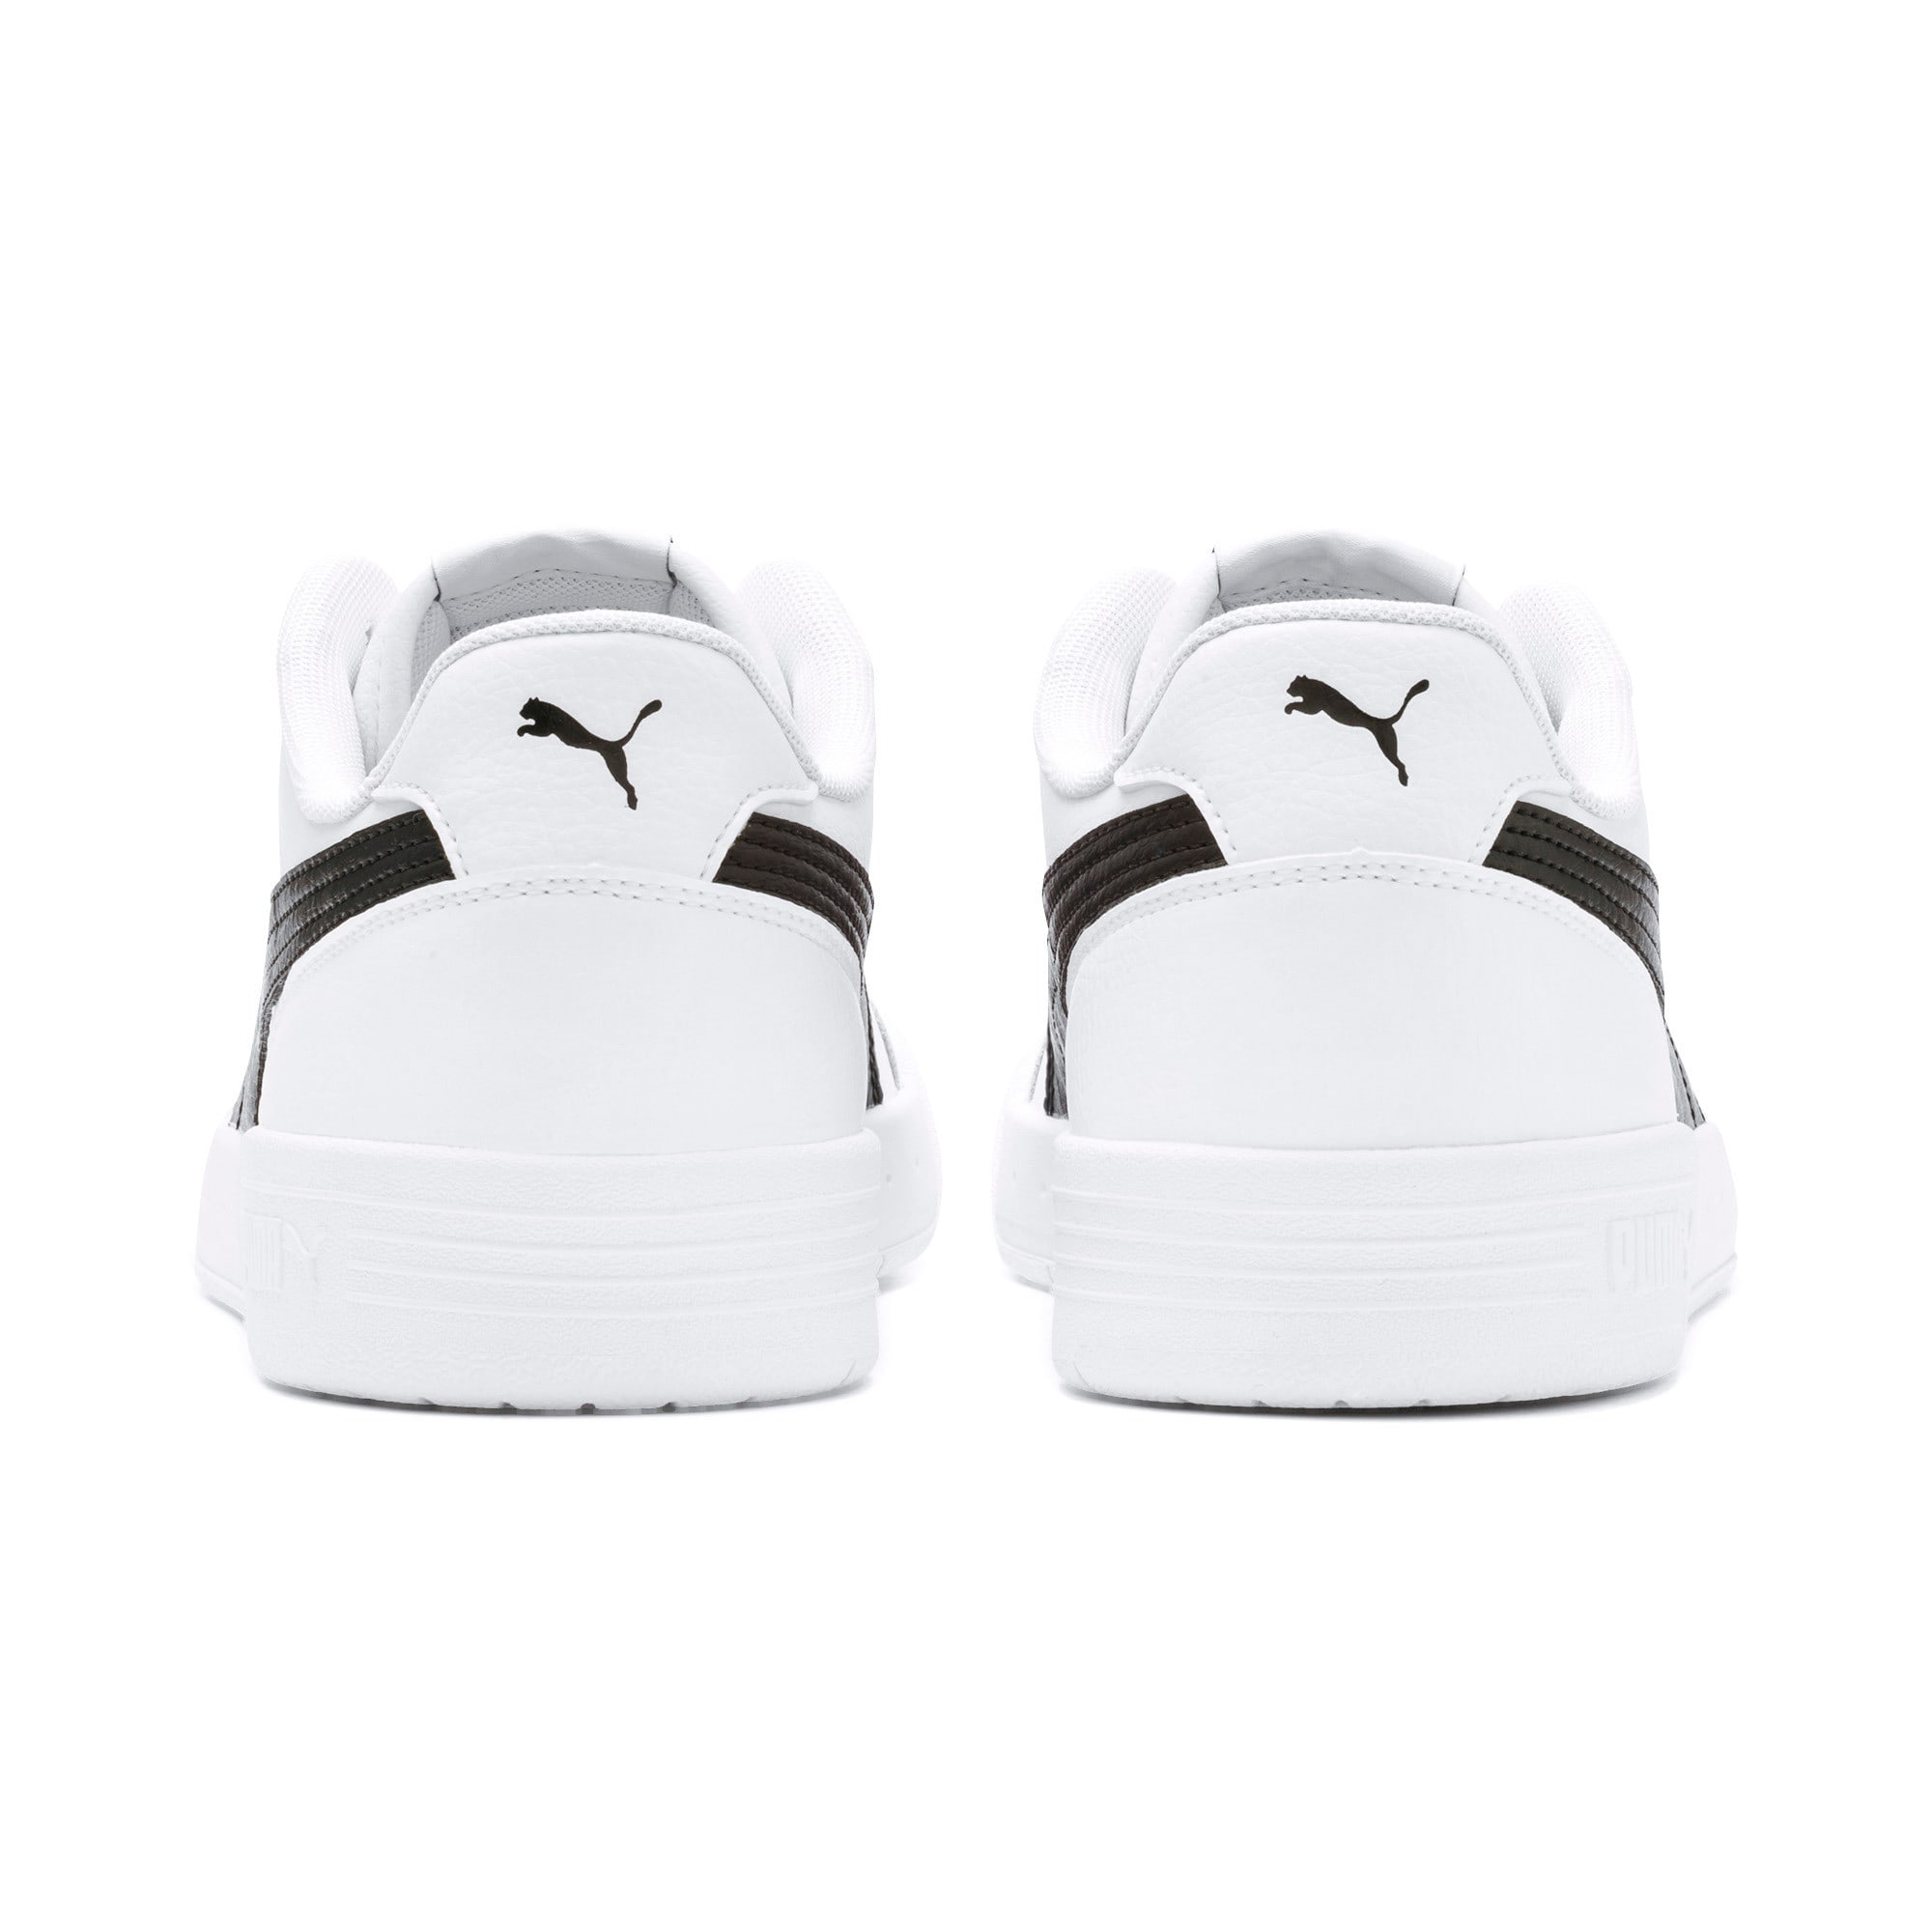 Thumbnail 4 of Caracal Sneakers, Puma White-Puma Black, medium